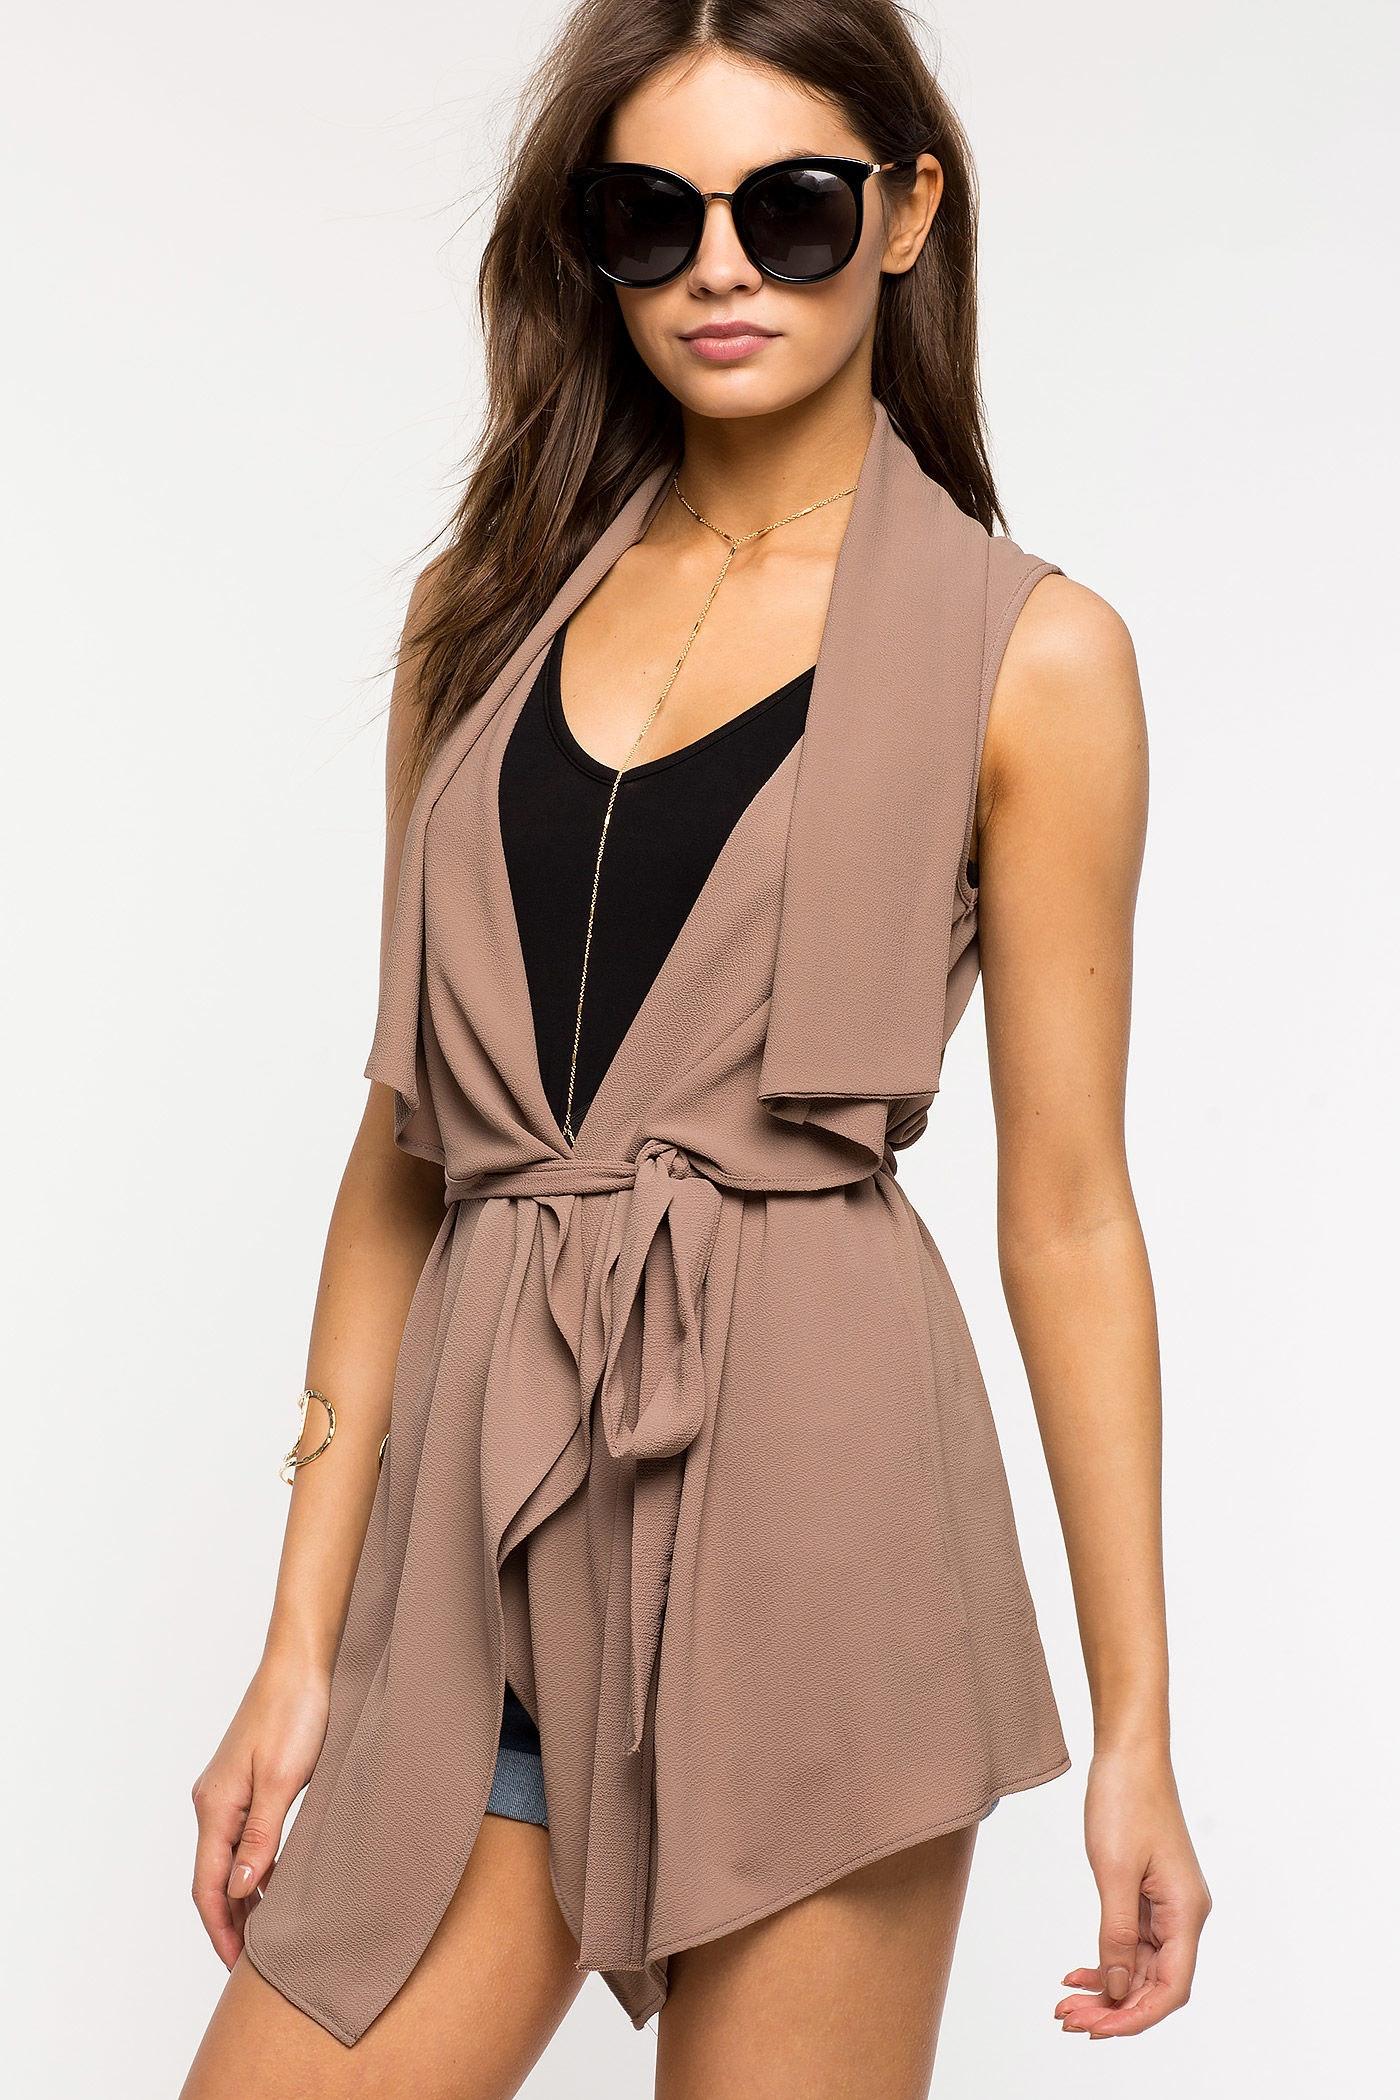 Cheap Trench Coats | Double Breasted Raincoat Womens | Sleeveless Trench Coat